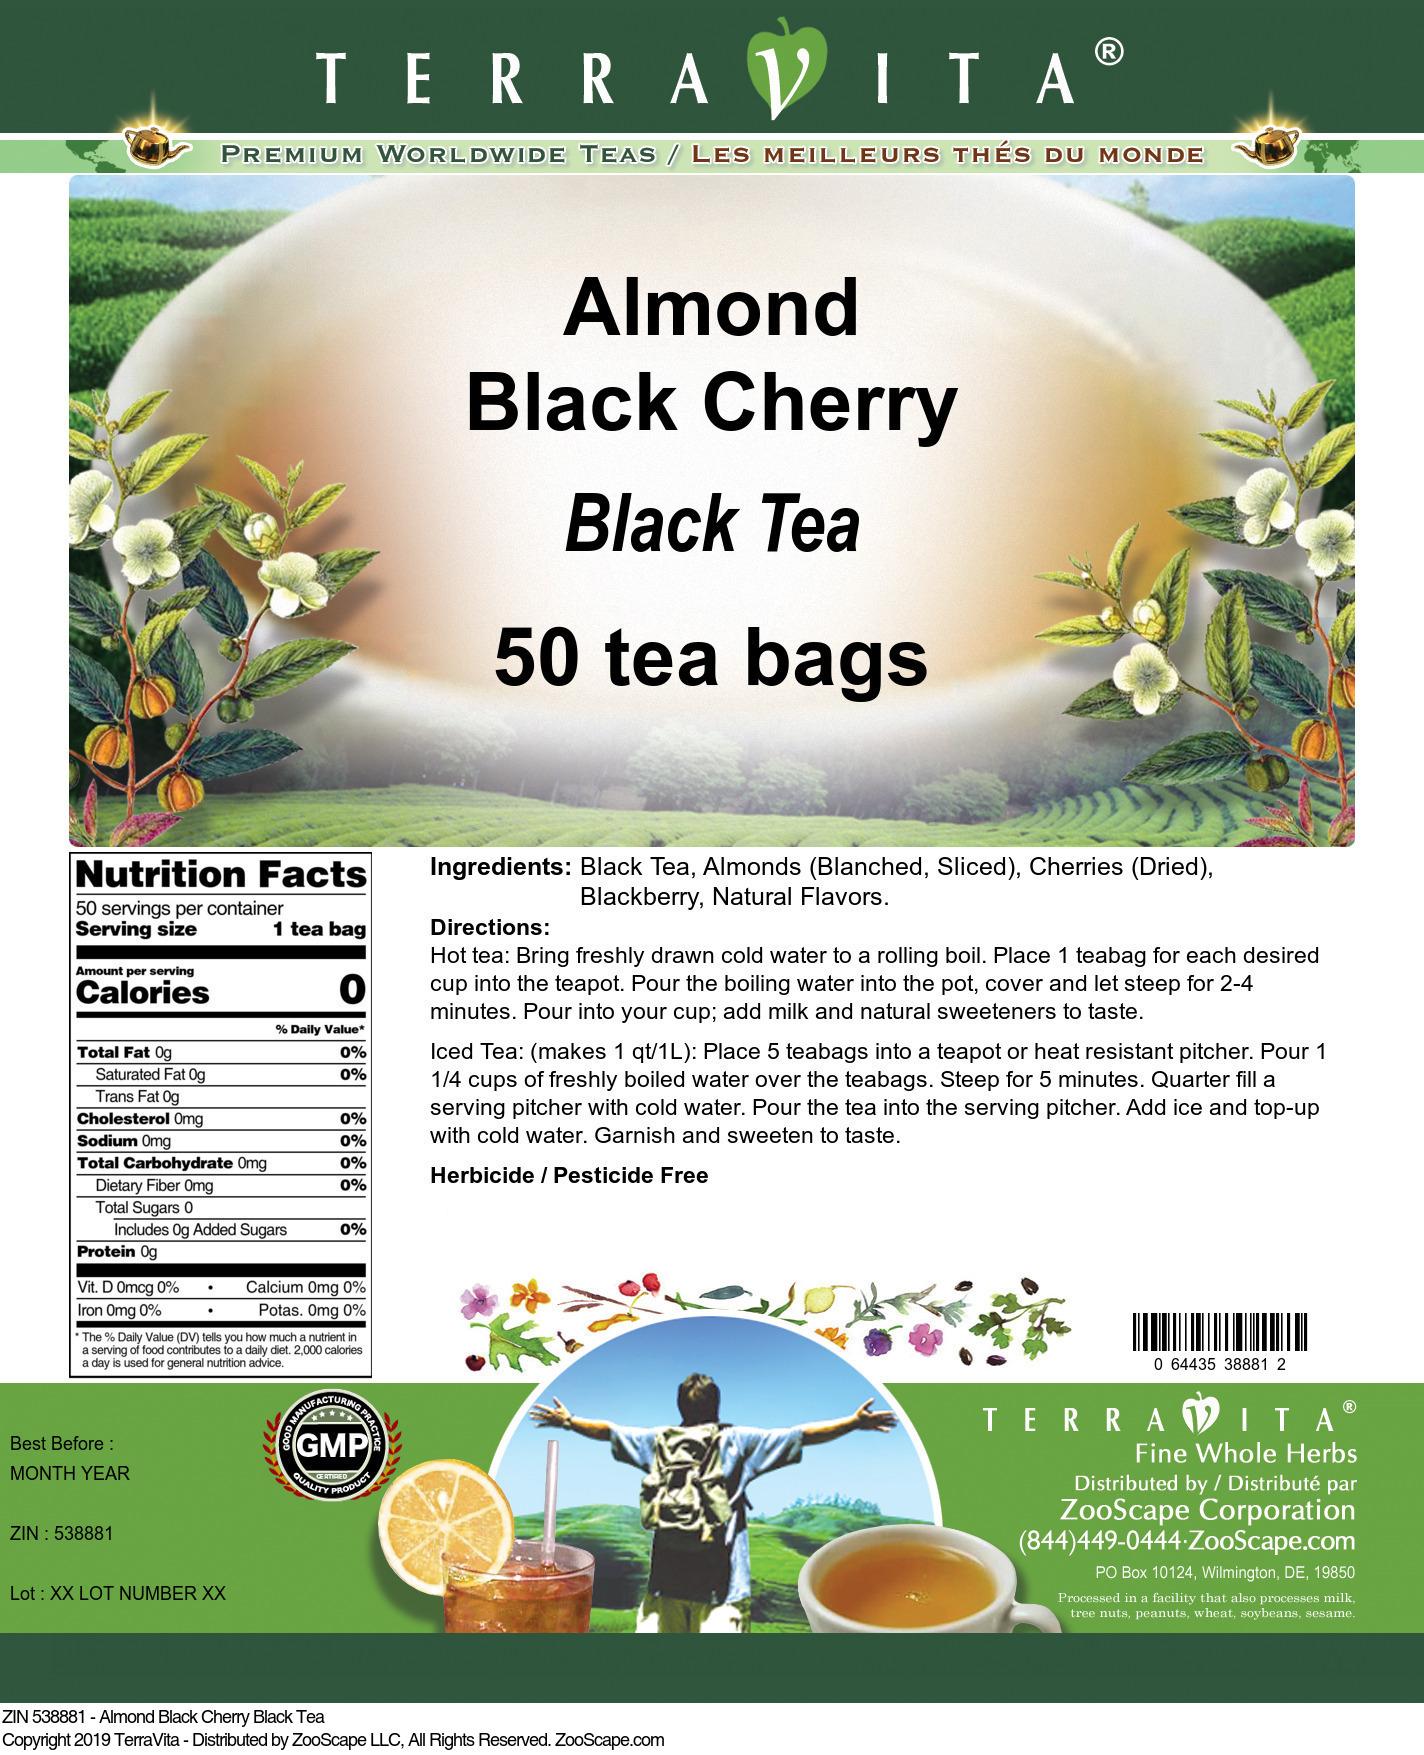 Almond Black Cherry Black Tea